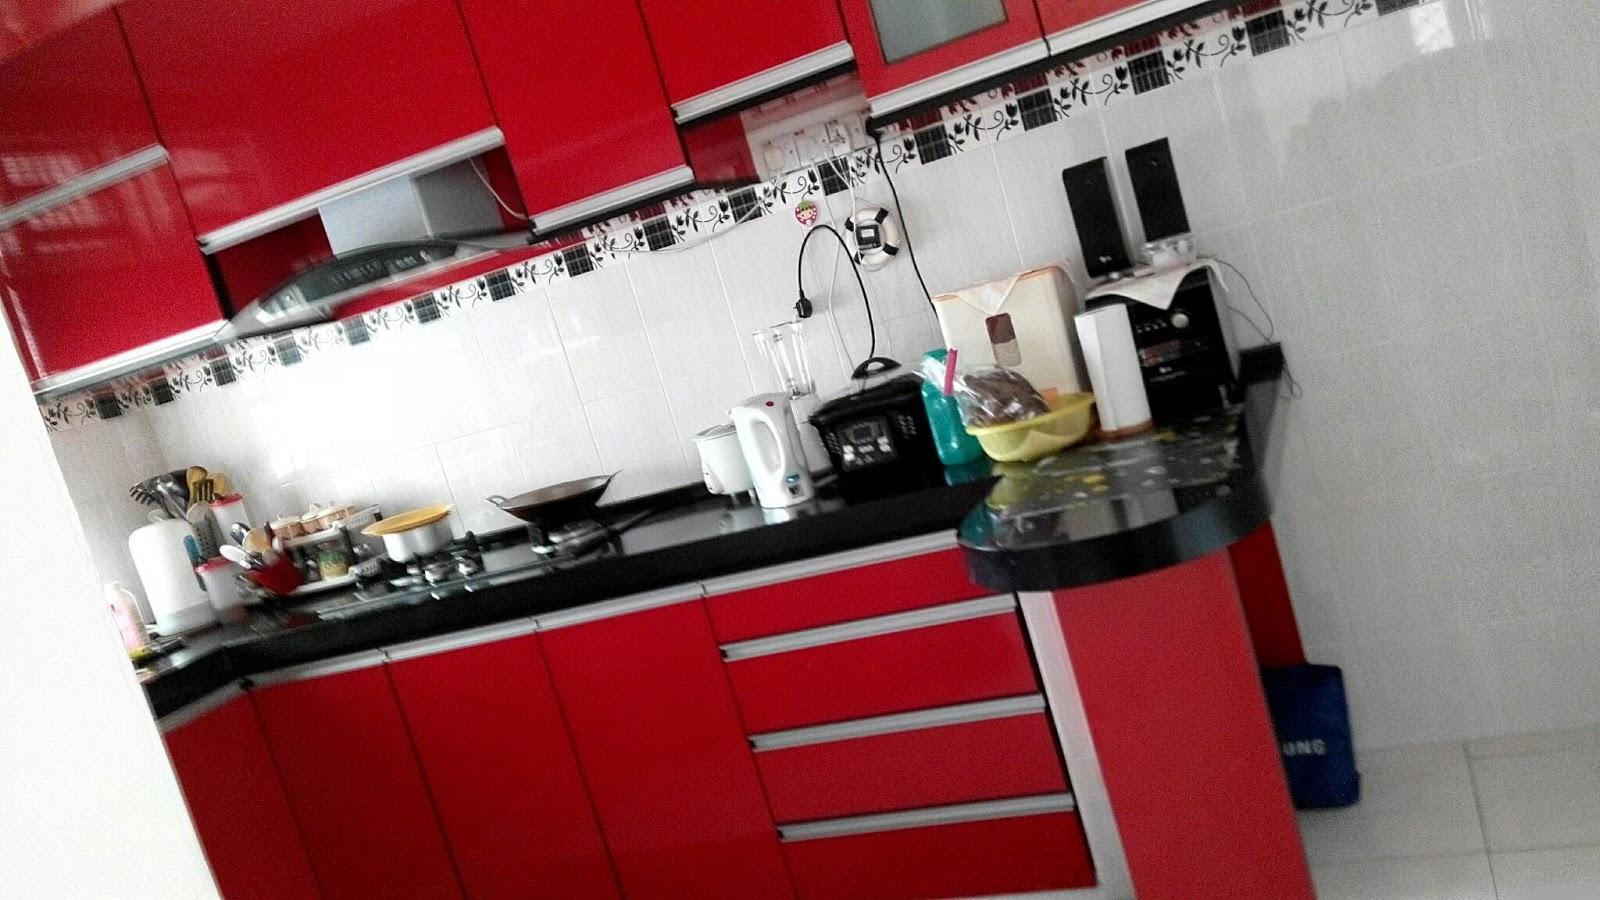 Dapur Gelap Tapi Jiran Belakang On Lampu Jasi Automatic Sbg Mlm Rumah Kami Hihi